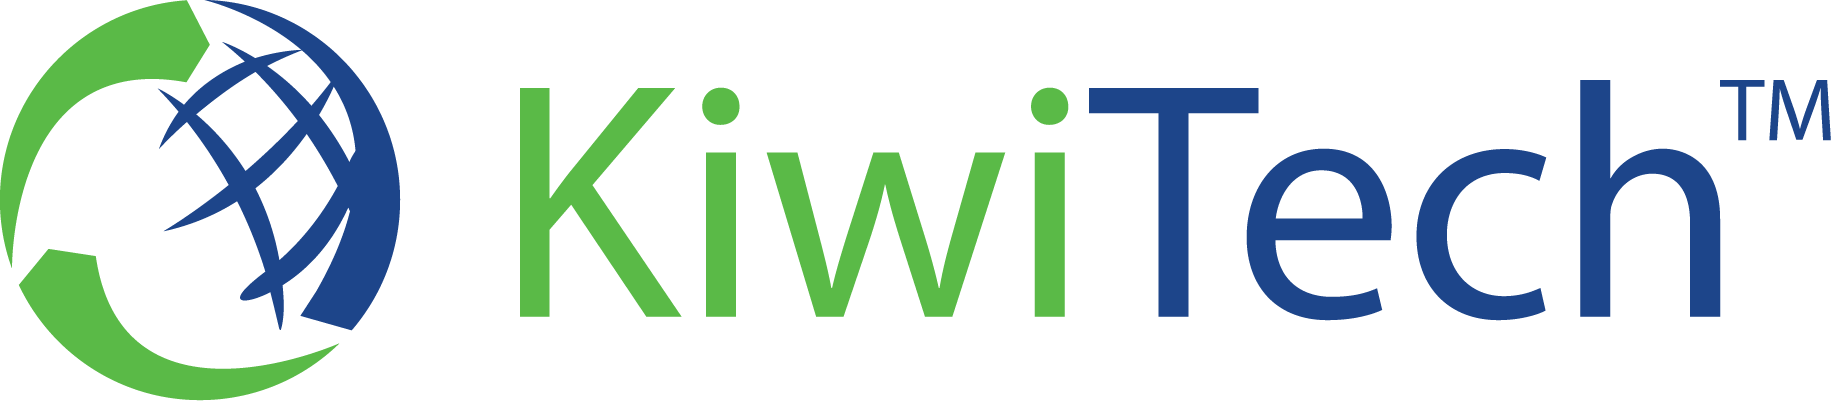 Web and Mobile Application Development Company – KiwiTech